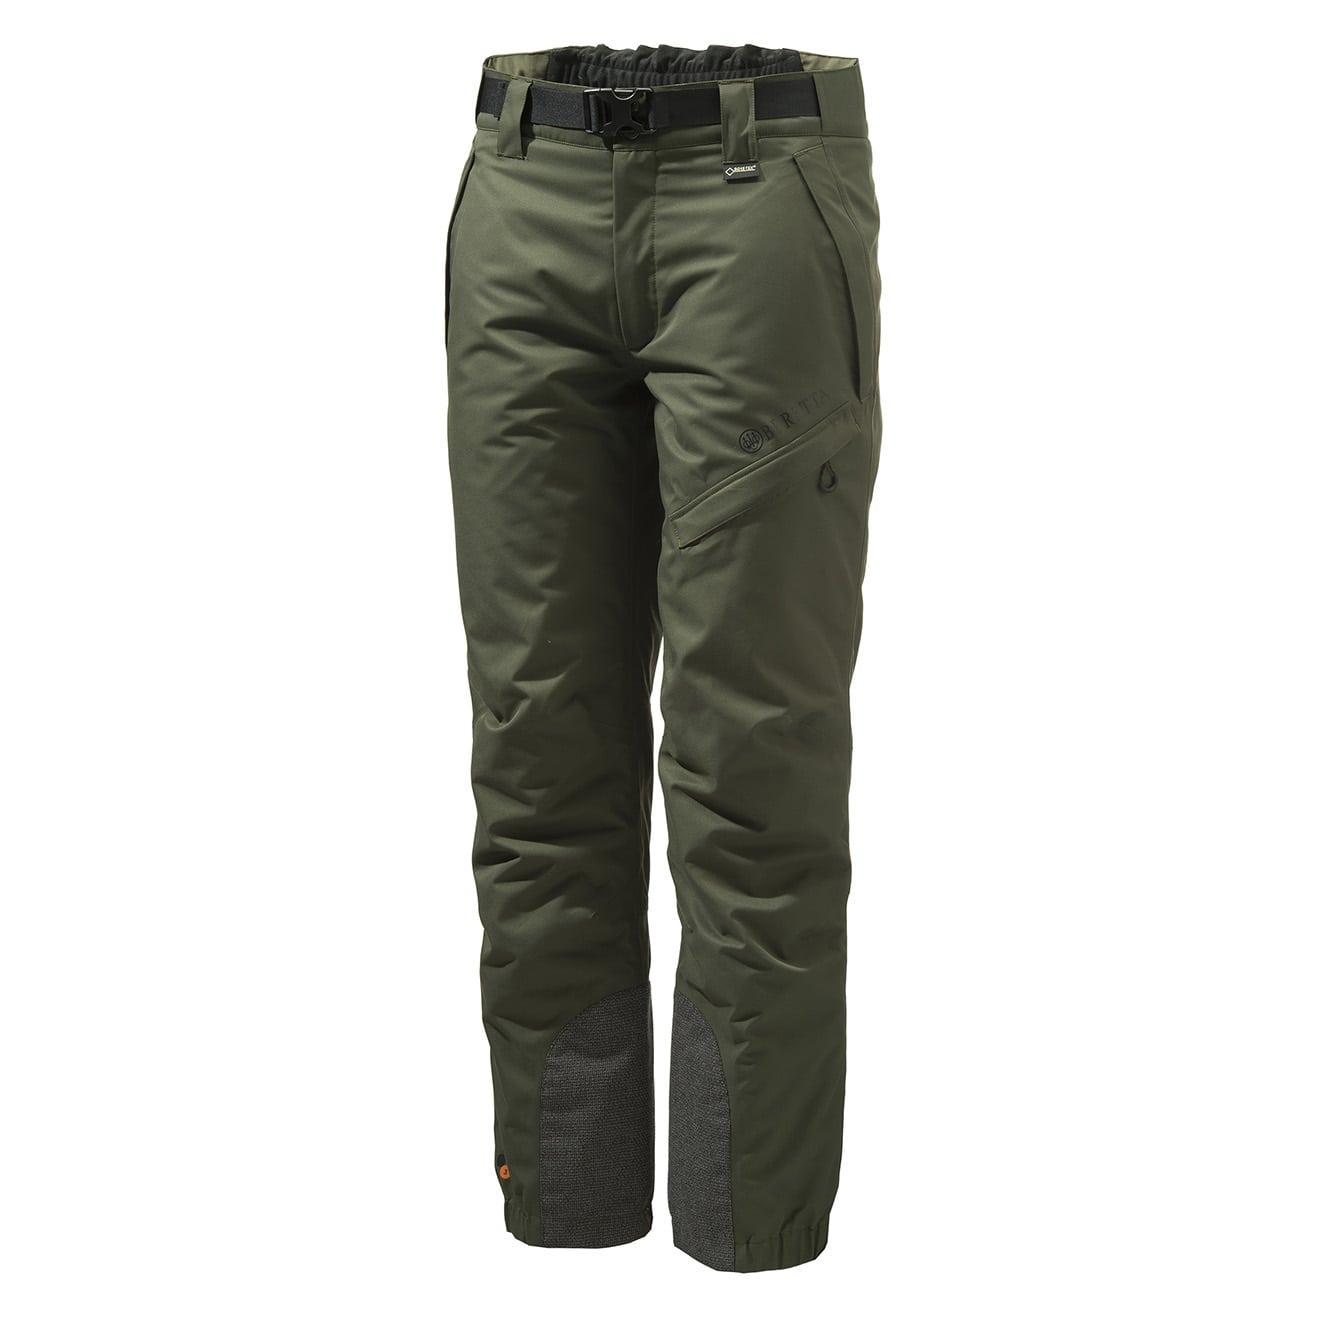 Beretta Heatdry Active Pants GTX Green